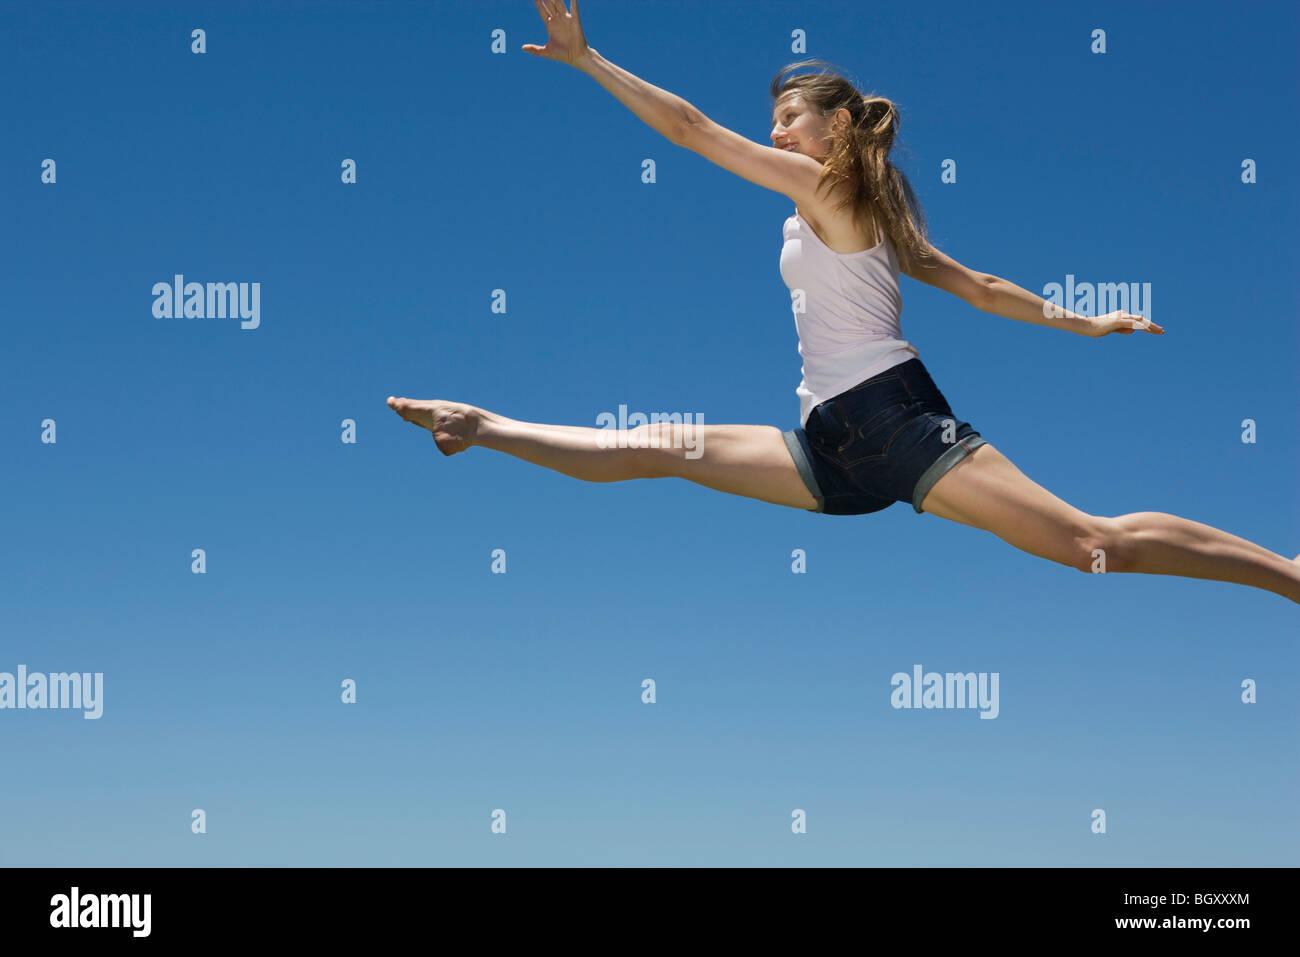 Junge Frau, springen, Luft Stockfoto